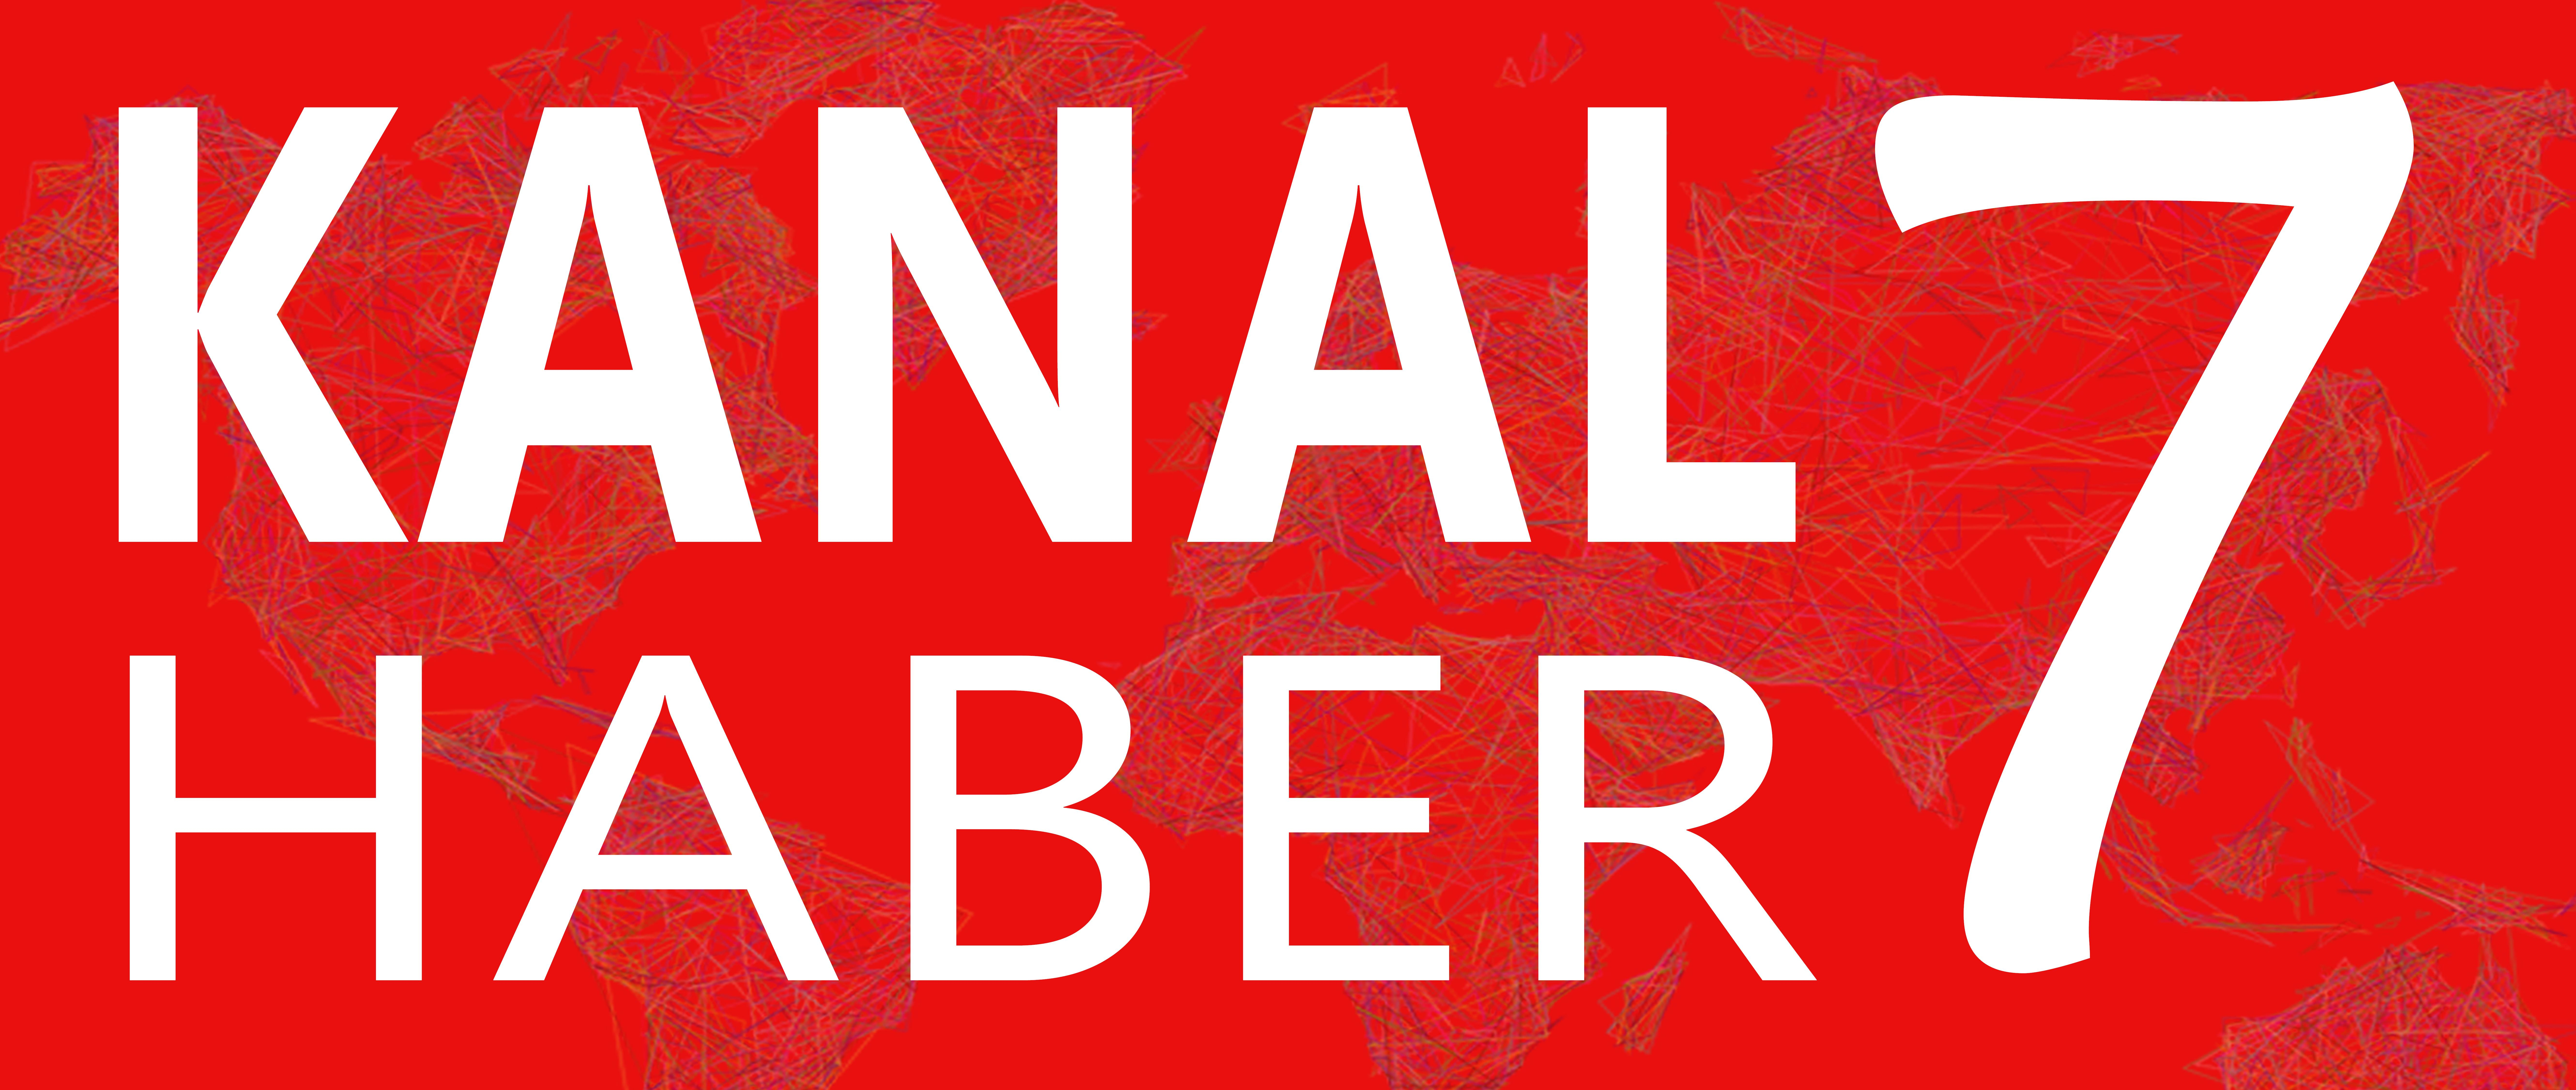 Kanal 7 Haber